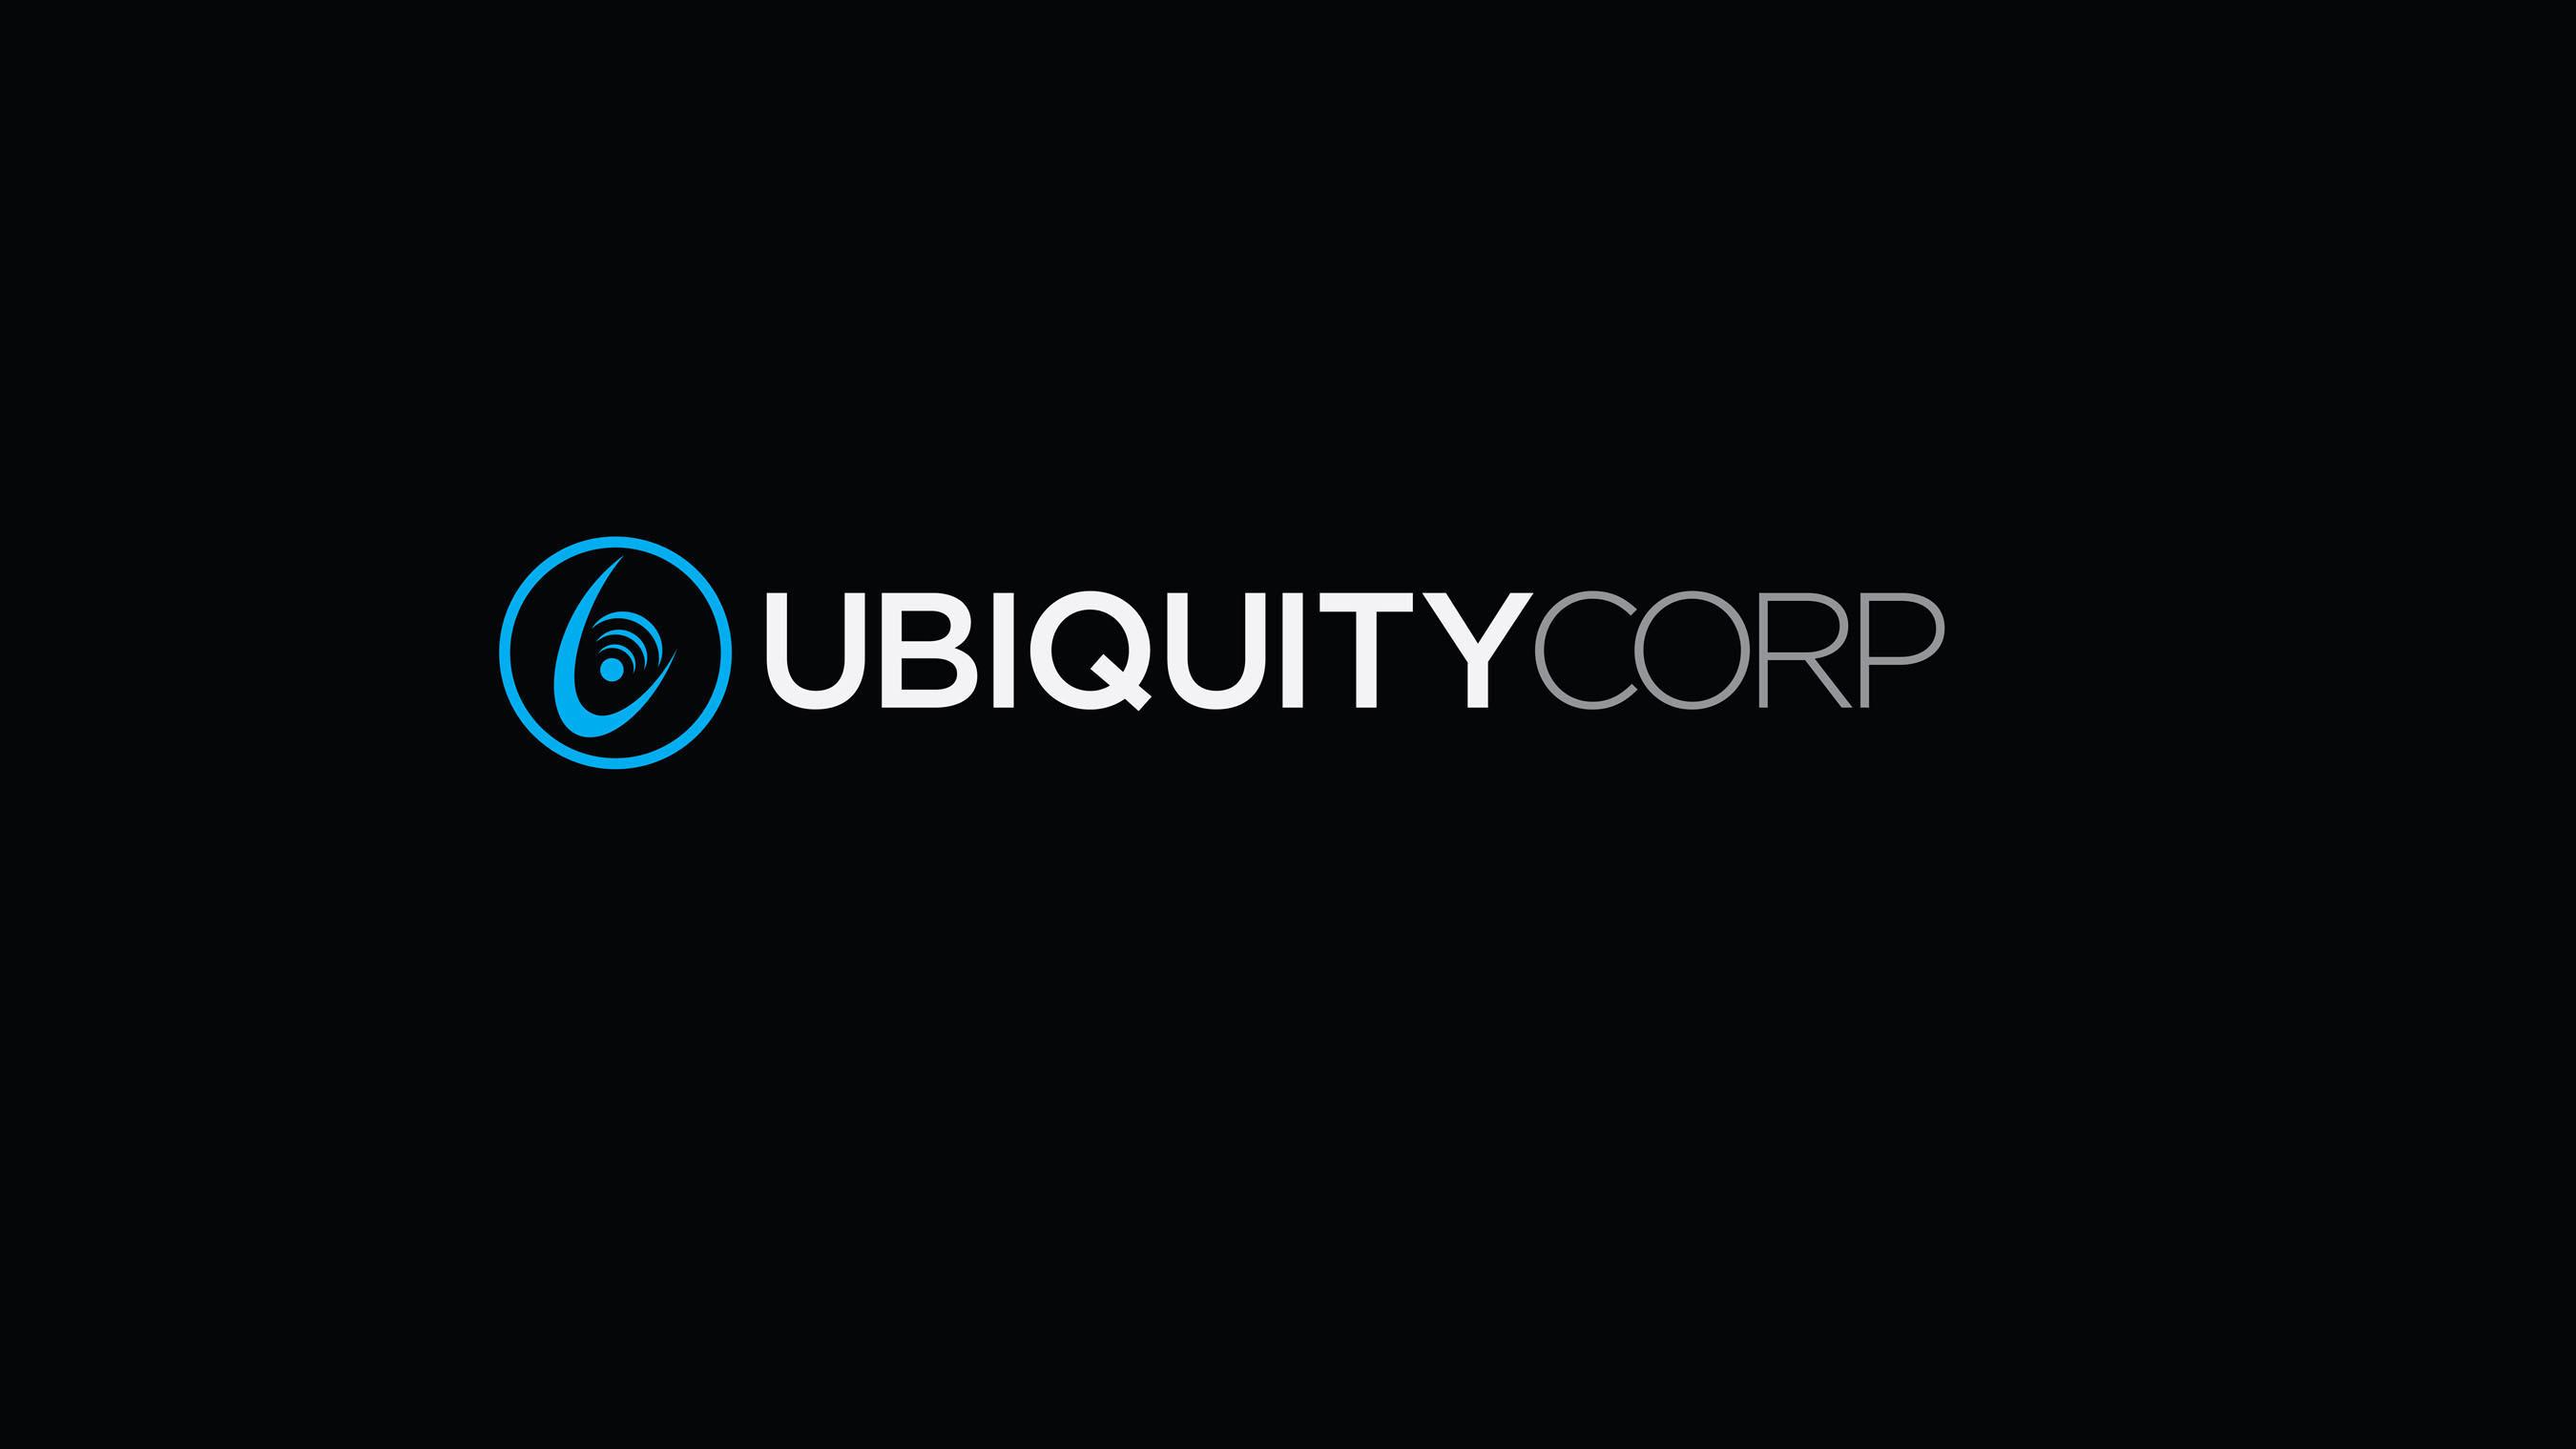 Ubiquity Corp Logo.